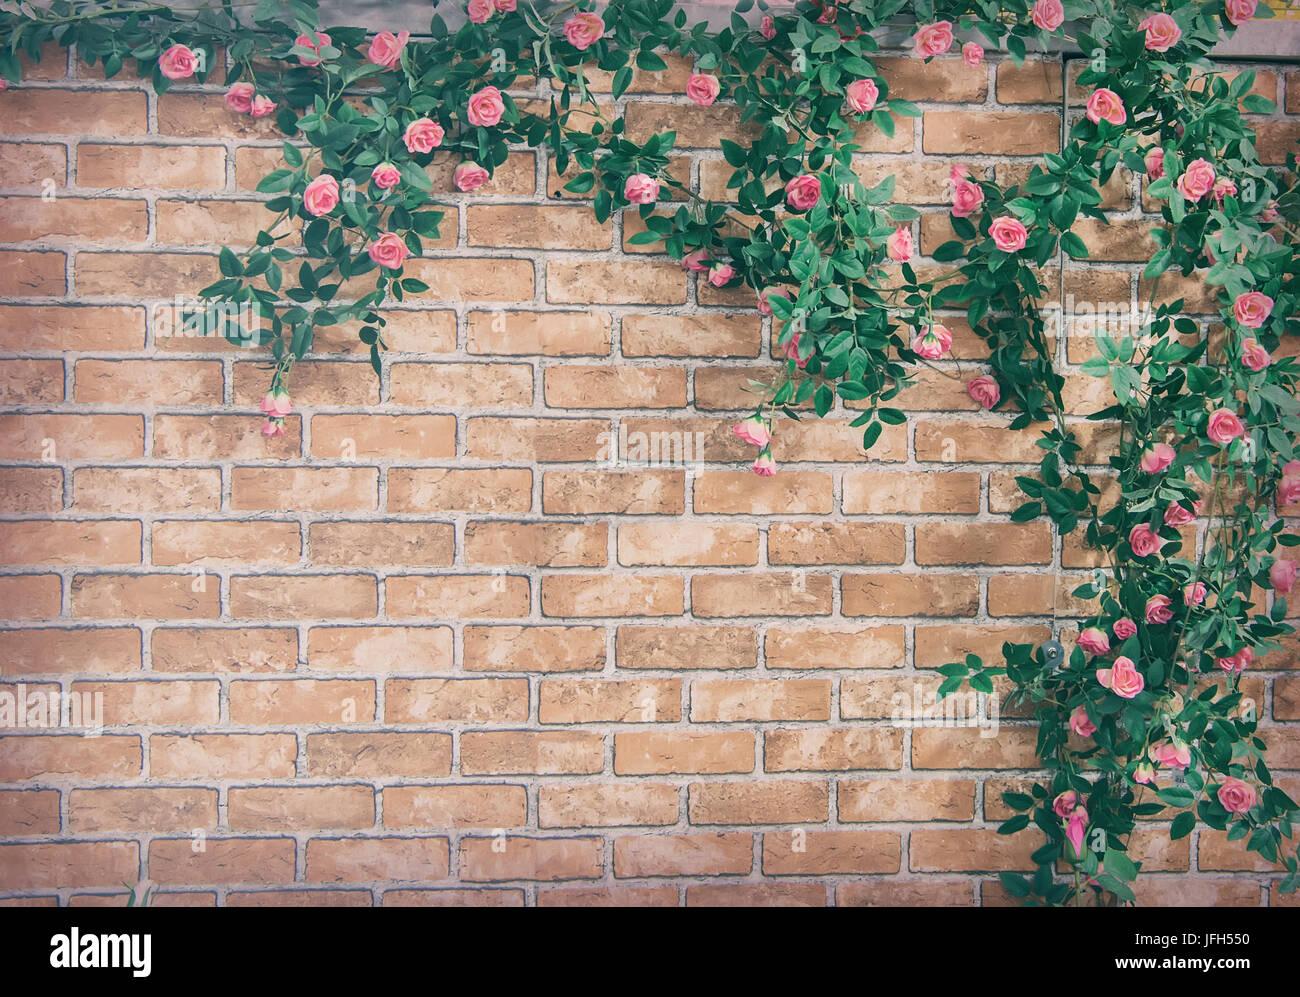 Bush Climbing Rose On A Brick Wall Background Artificial